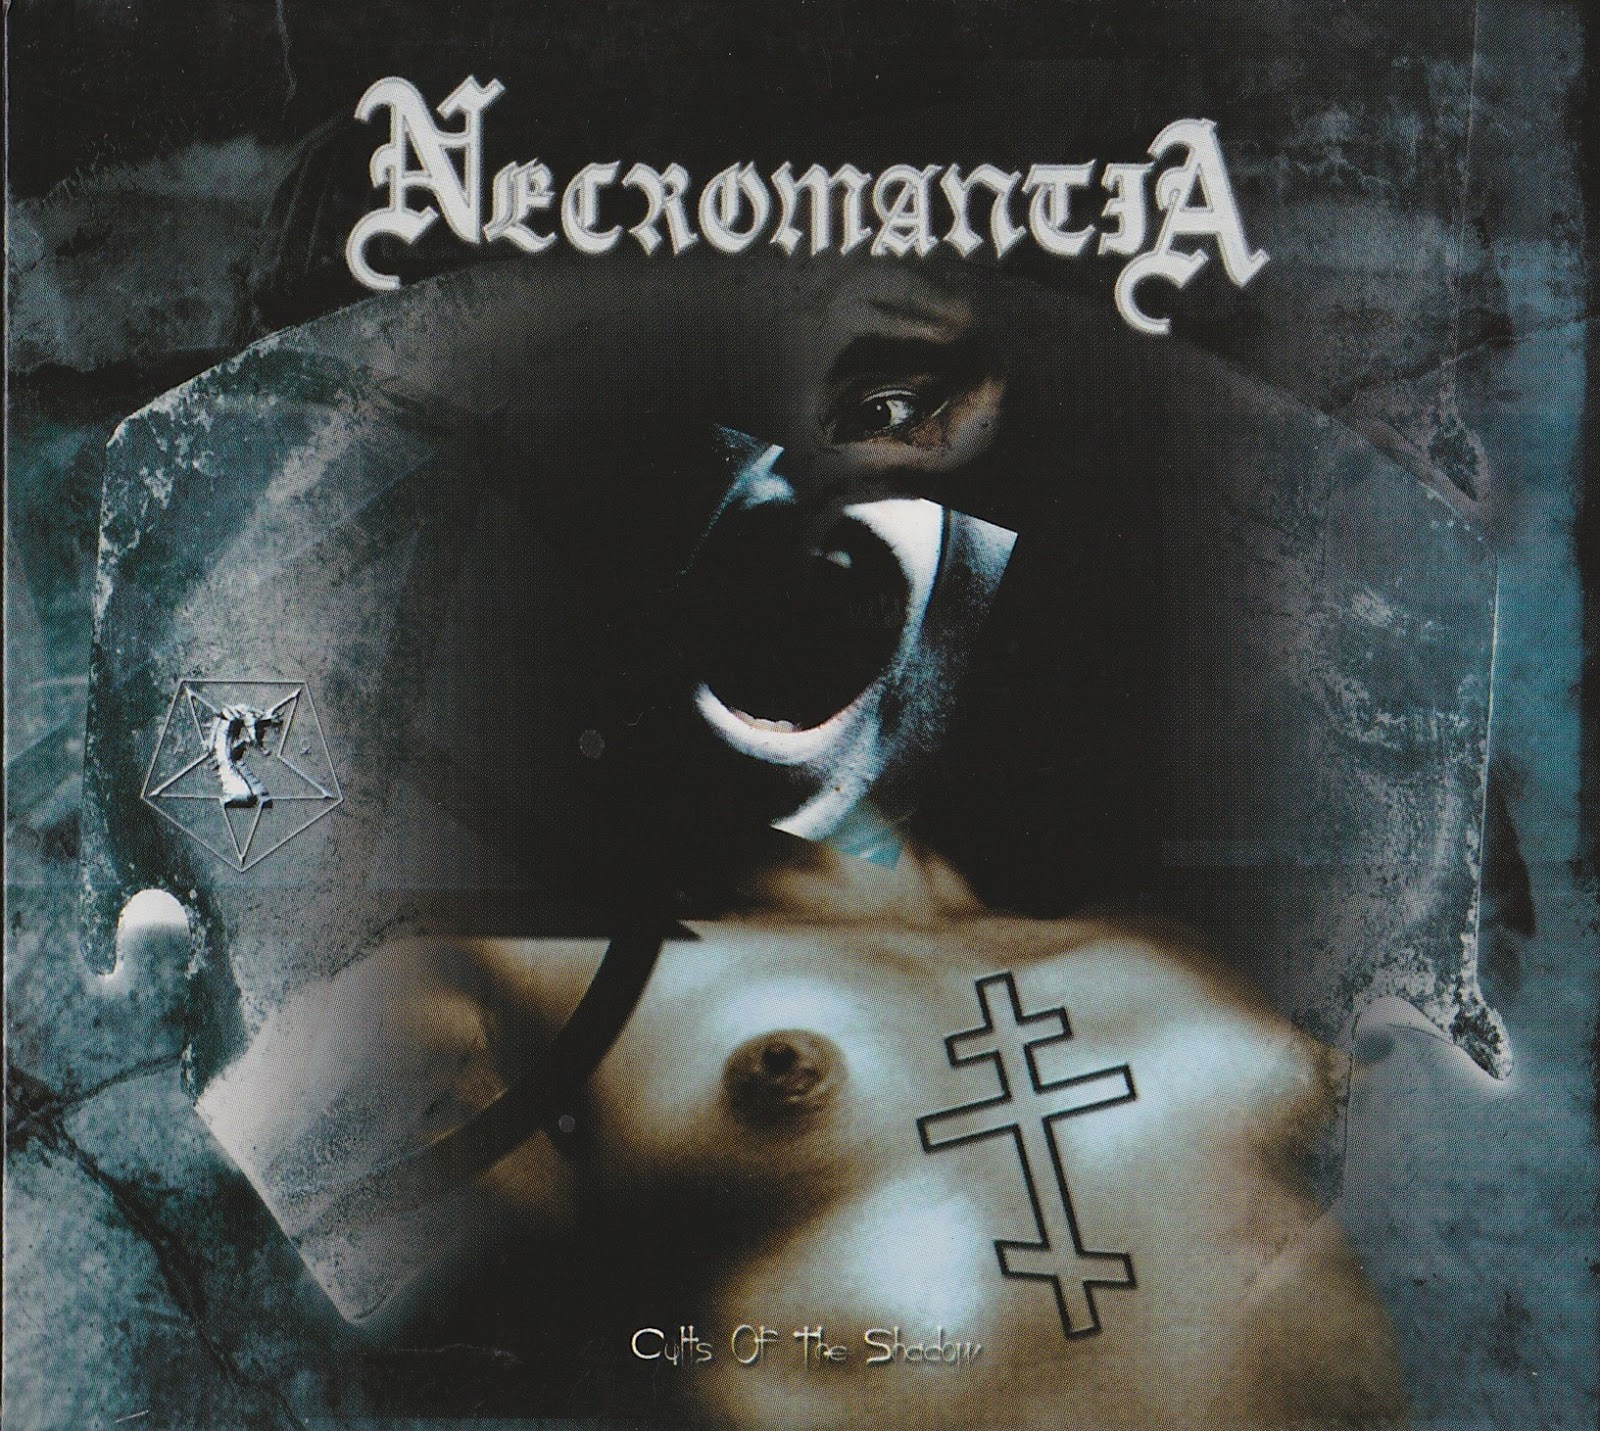 Necromantia — Crossing The Fiery Path (1993)